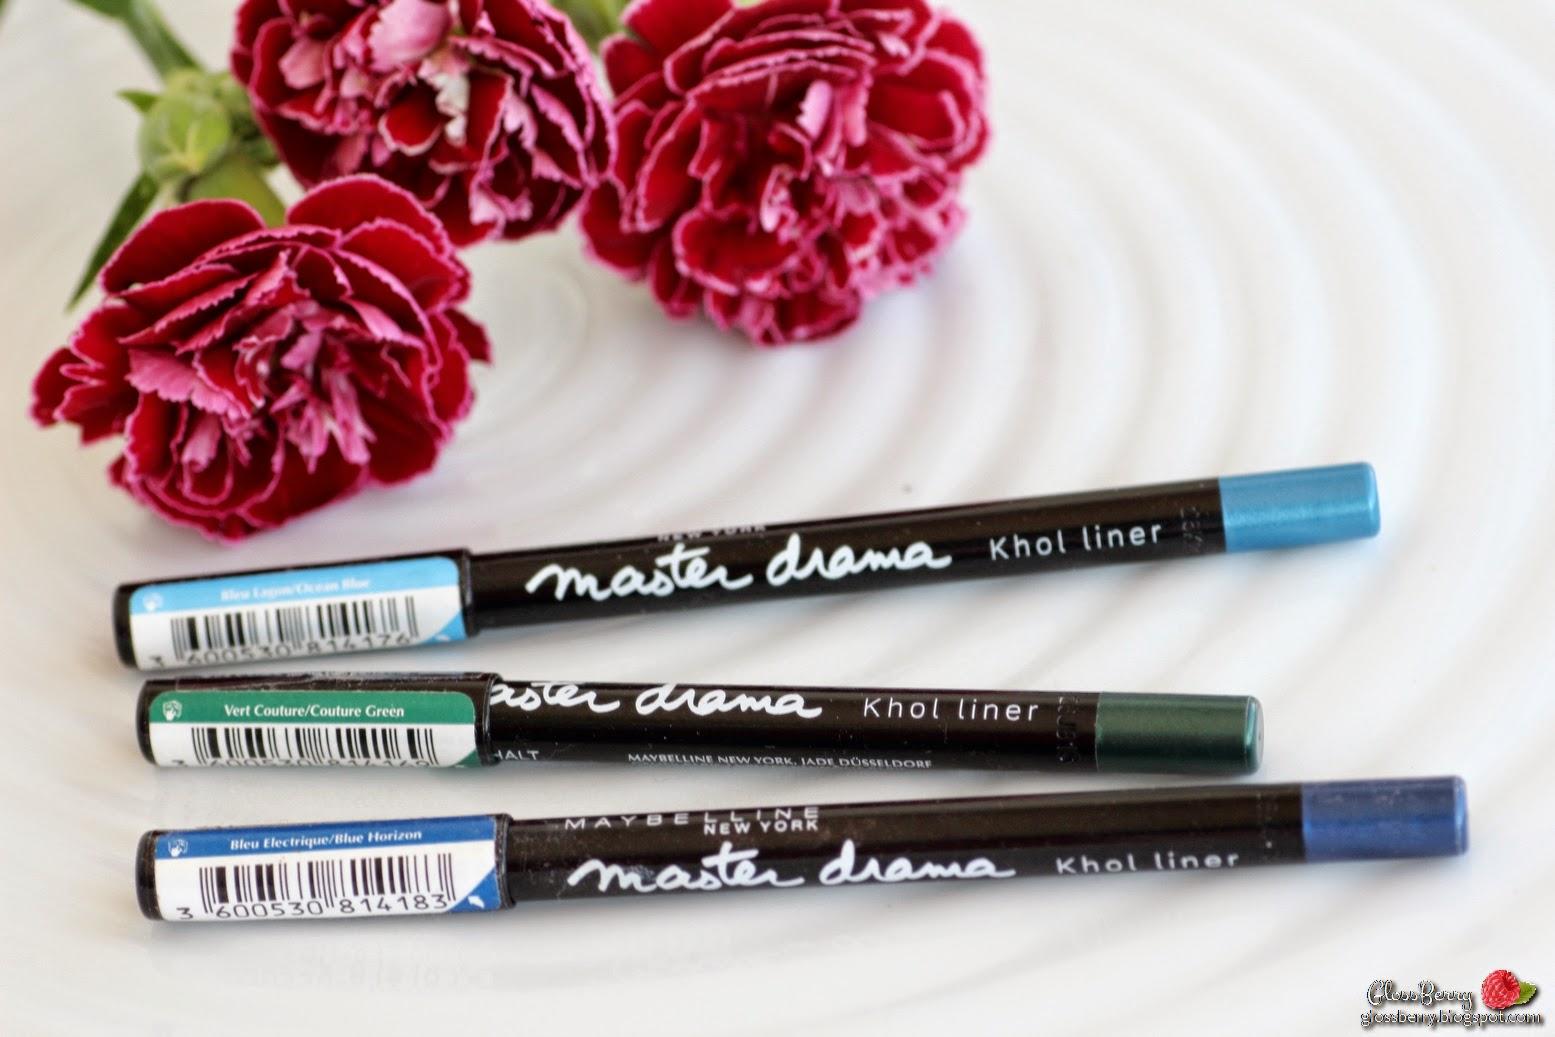 maybelline master drama eyeliner kohl liner review swatches סקירה עפרונות עיניים של מייבילין כחול ירוק blue green תכלת glossberry גלוסברי